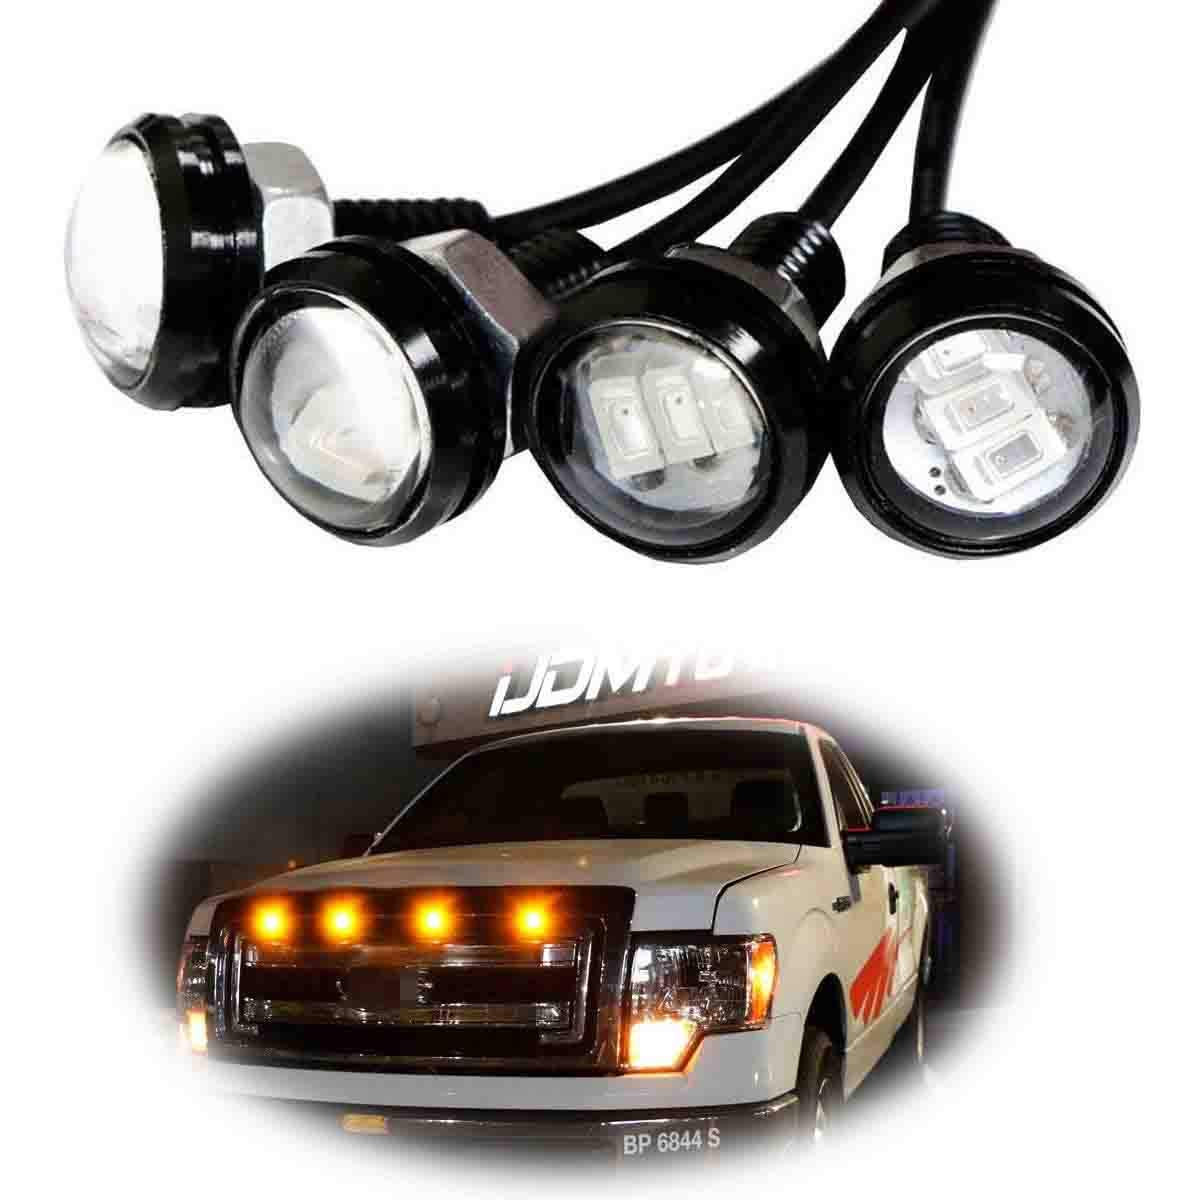 Partsam 3PCS 3000K Amber Yellow LED Lamps Eagle Eye Lights Front Grille Lighting Kit//License Plate Lights